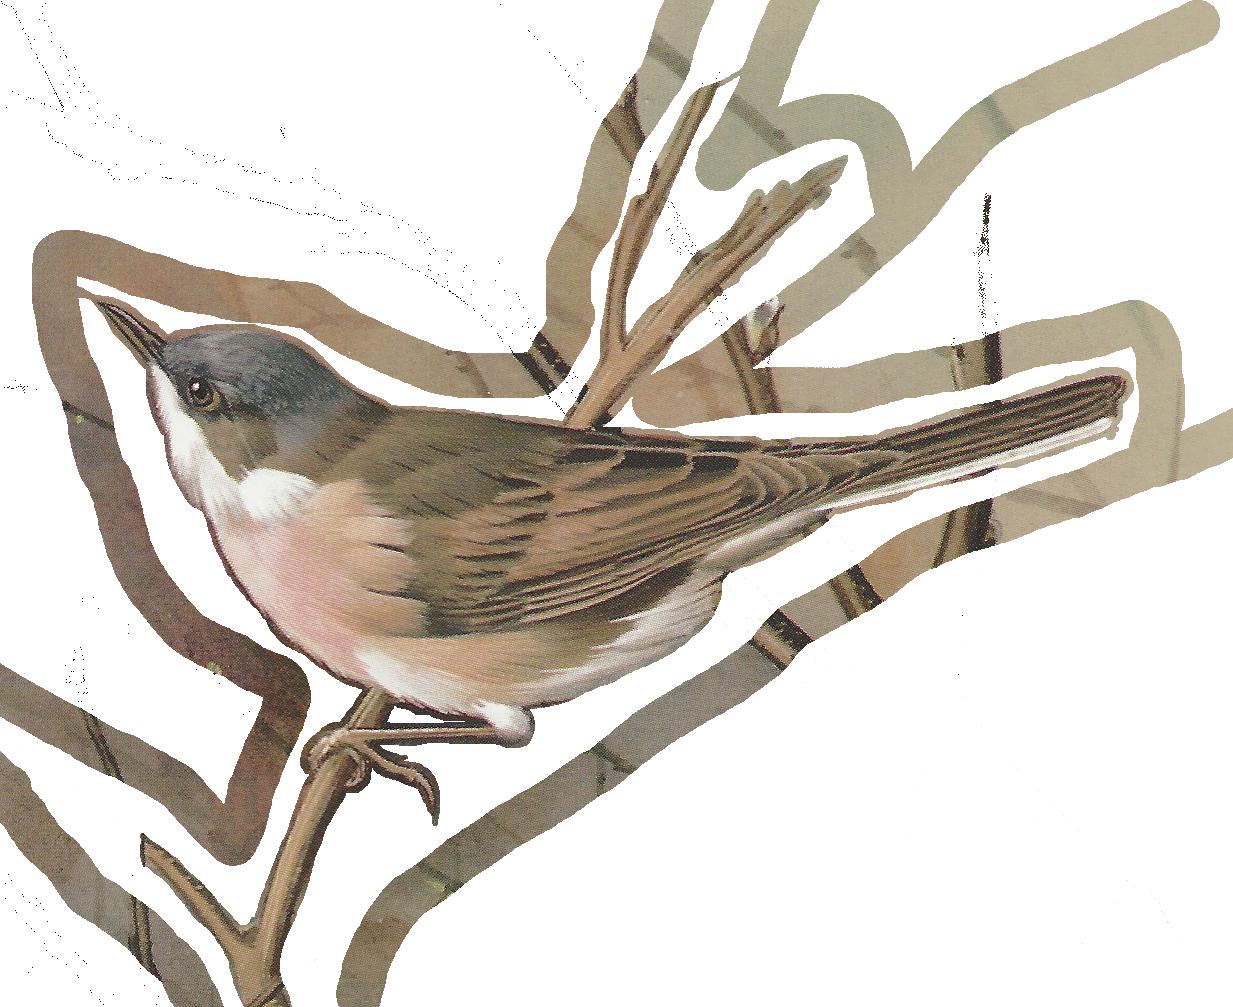 Displaying The Whitethroat Male Warblerpainting Png Vintage Bird Illustration Vintage Birds Bird Printables